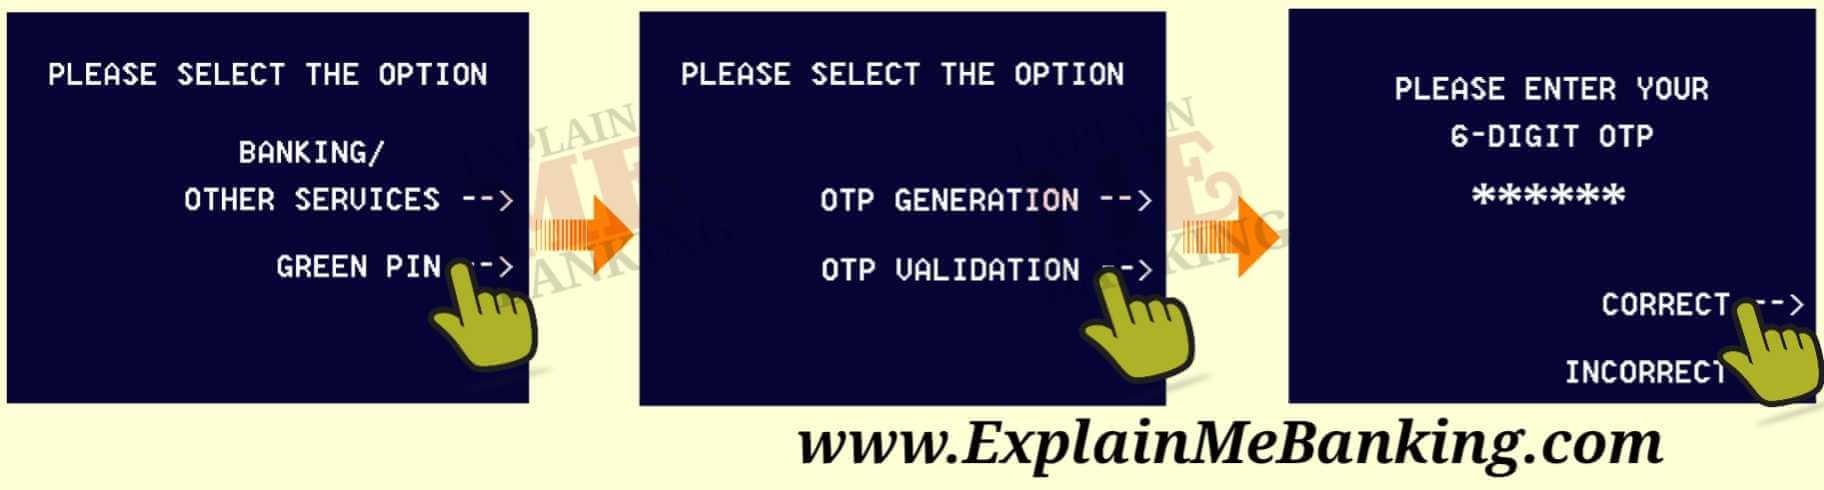 Punjab and Sind Bank ATM Green Pin OTP Validation